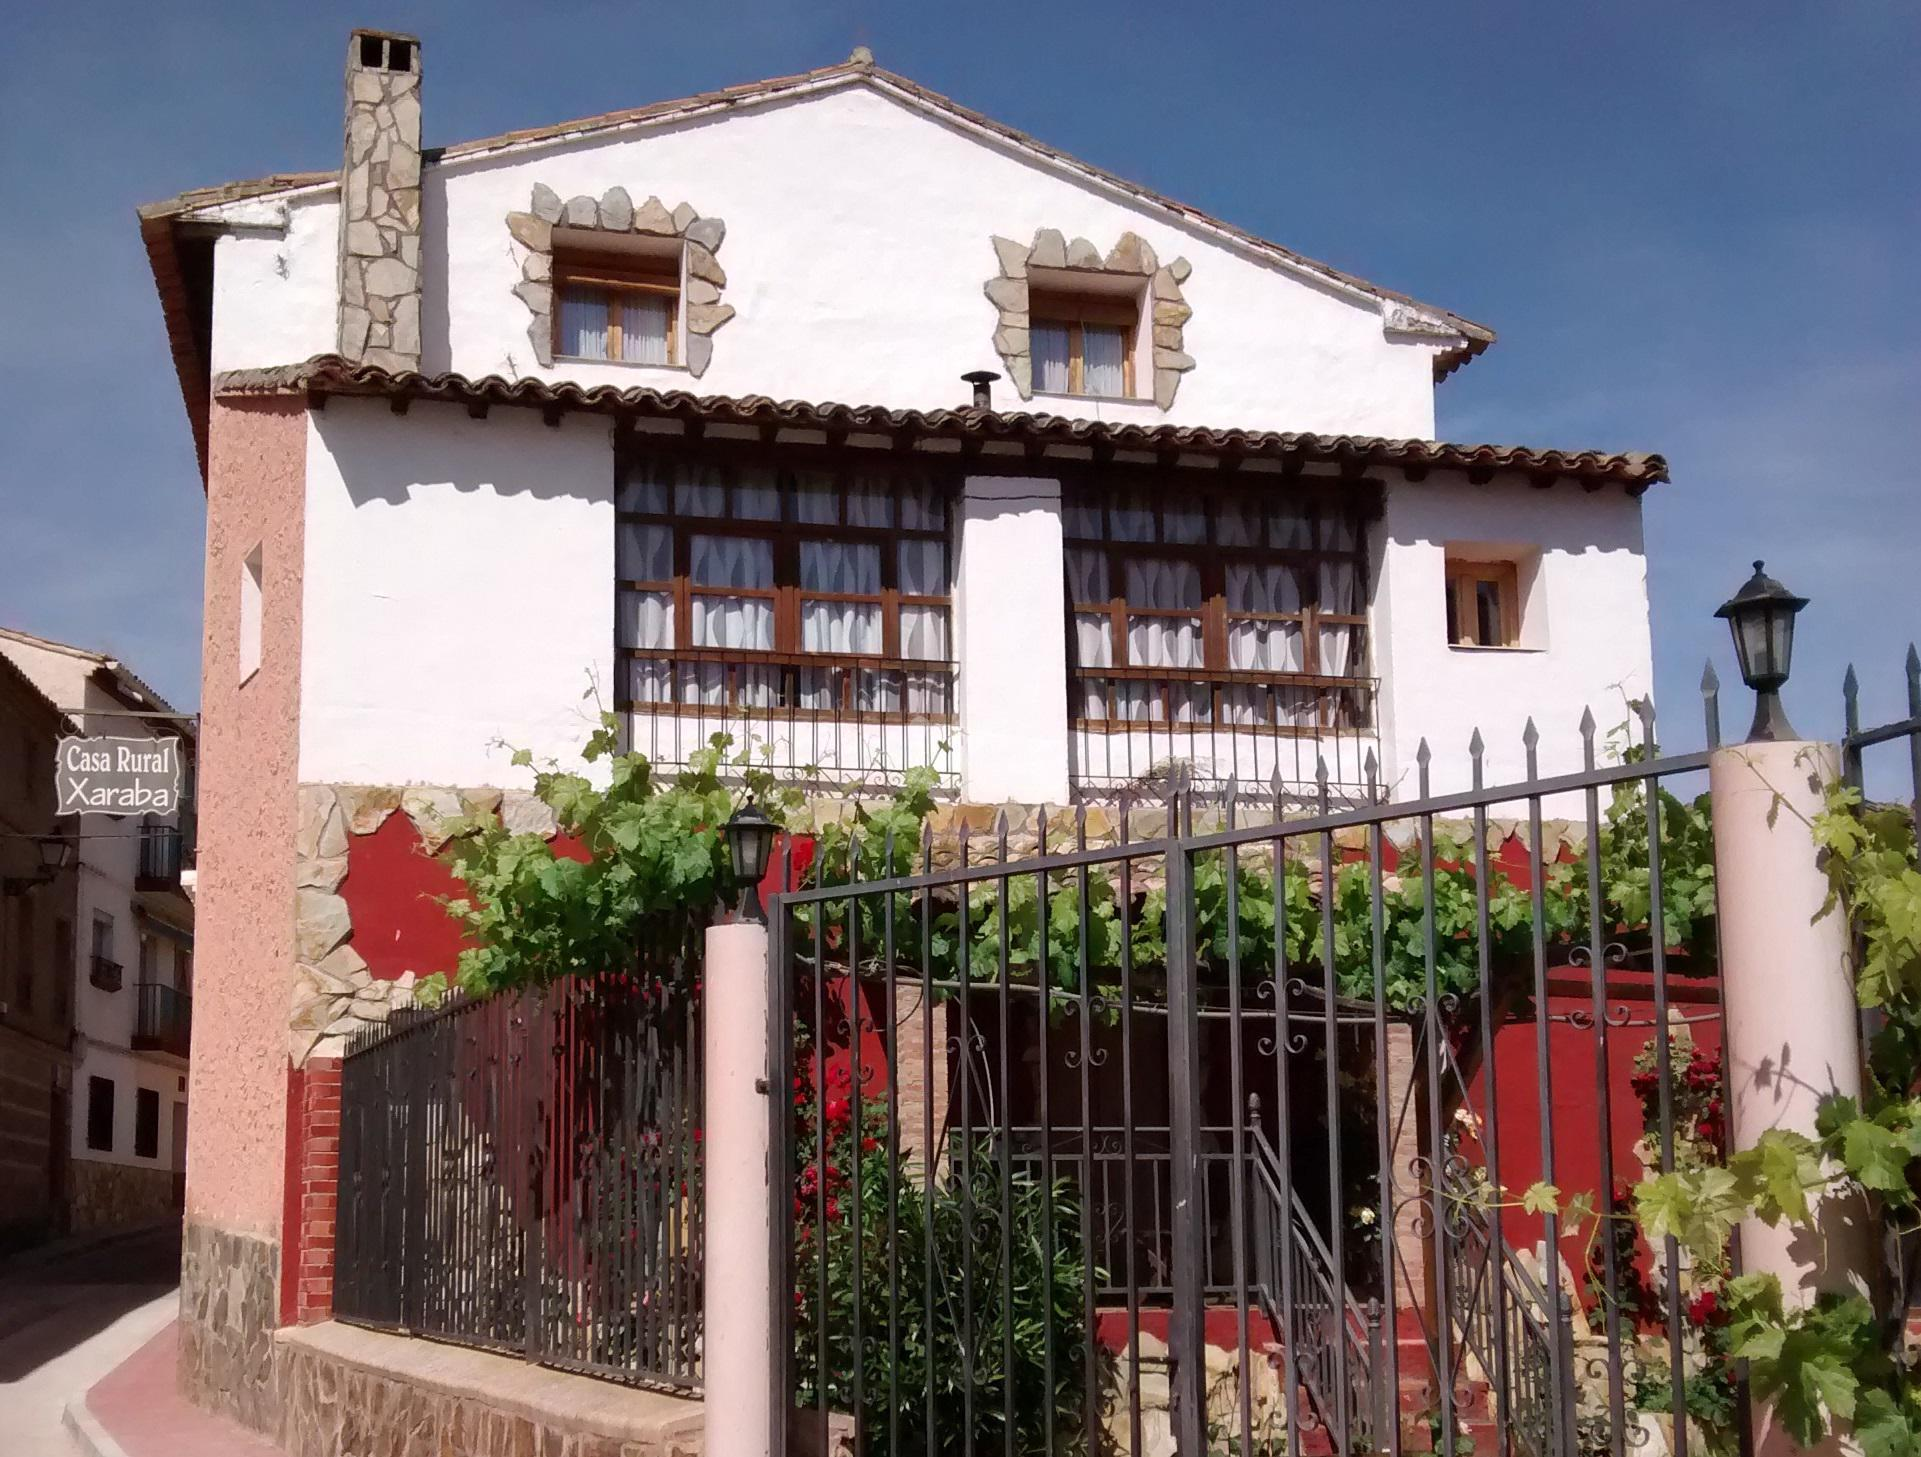 fotos de casa rural xaraba zaragoza jaraba clubrural On casa moderna zaragoza